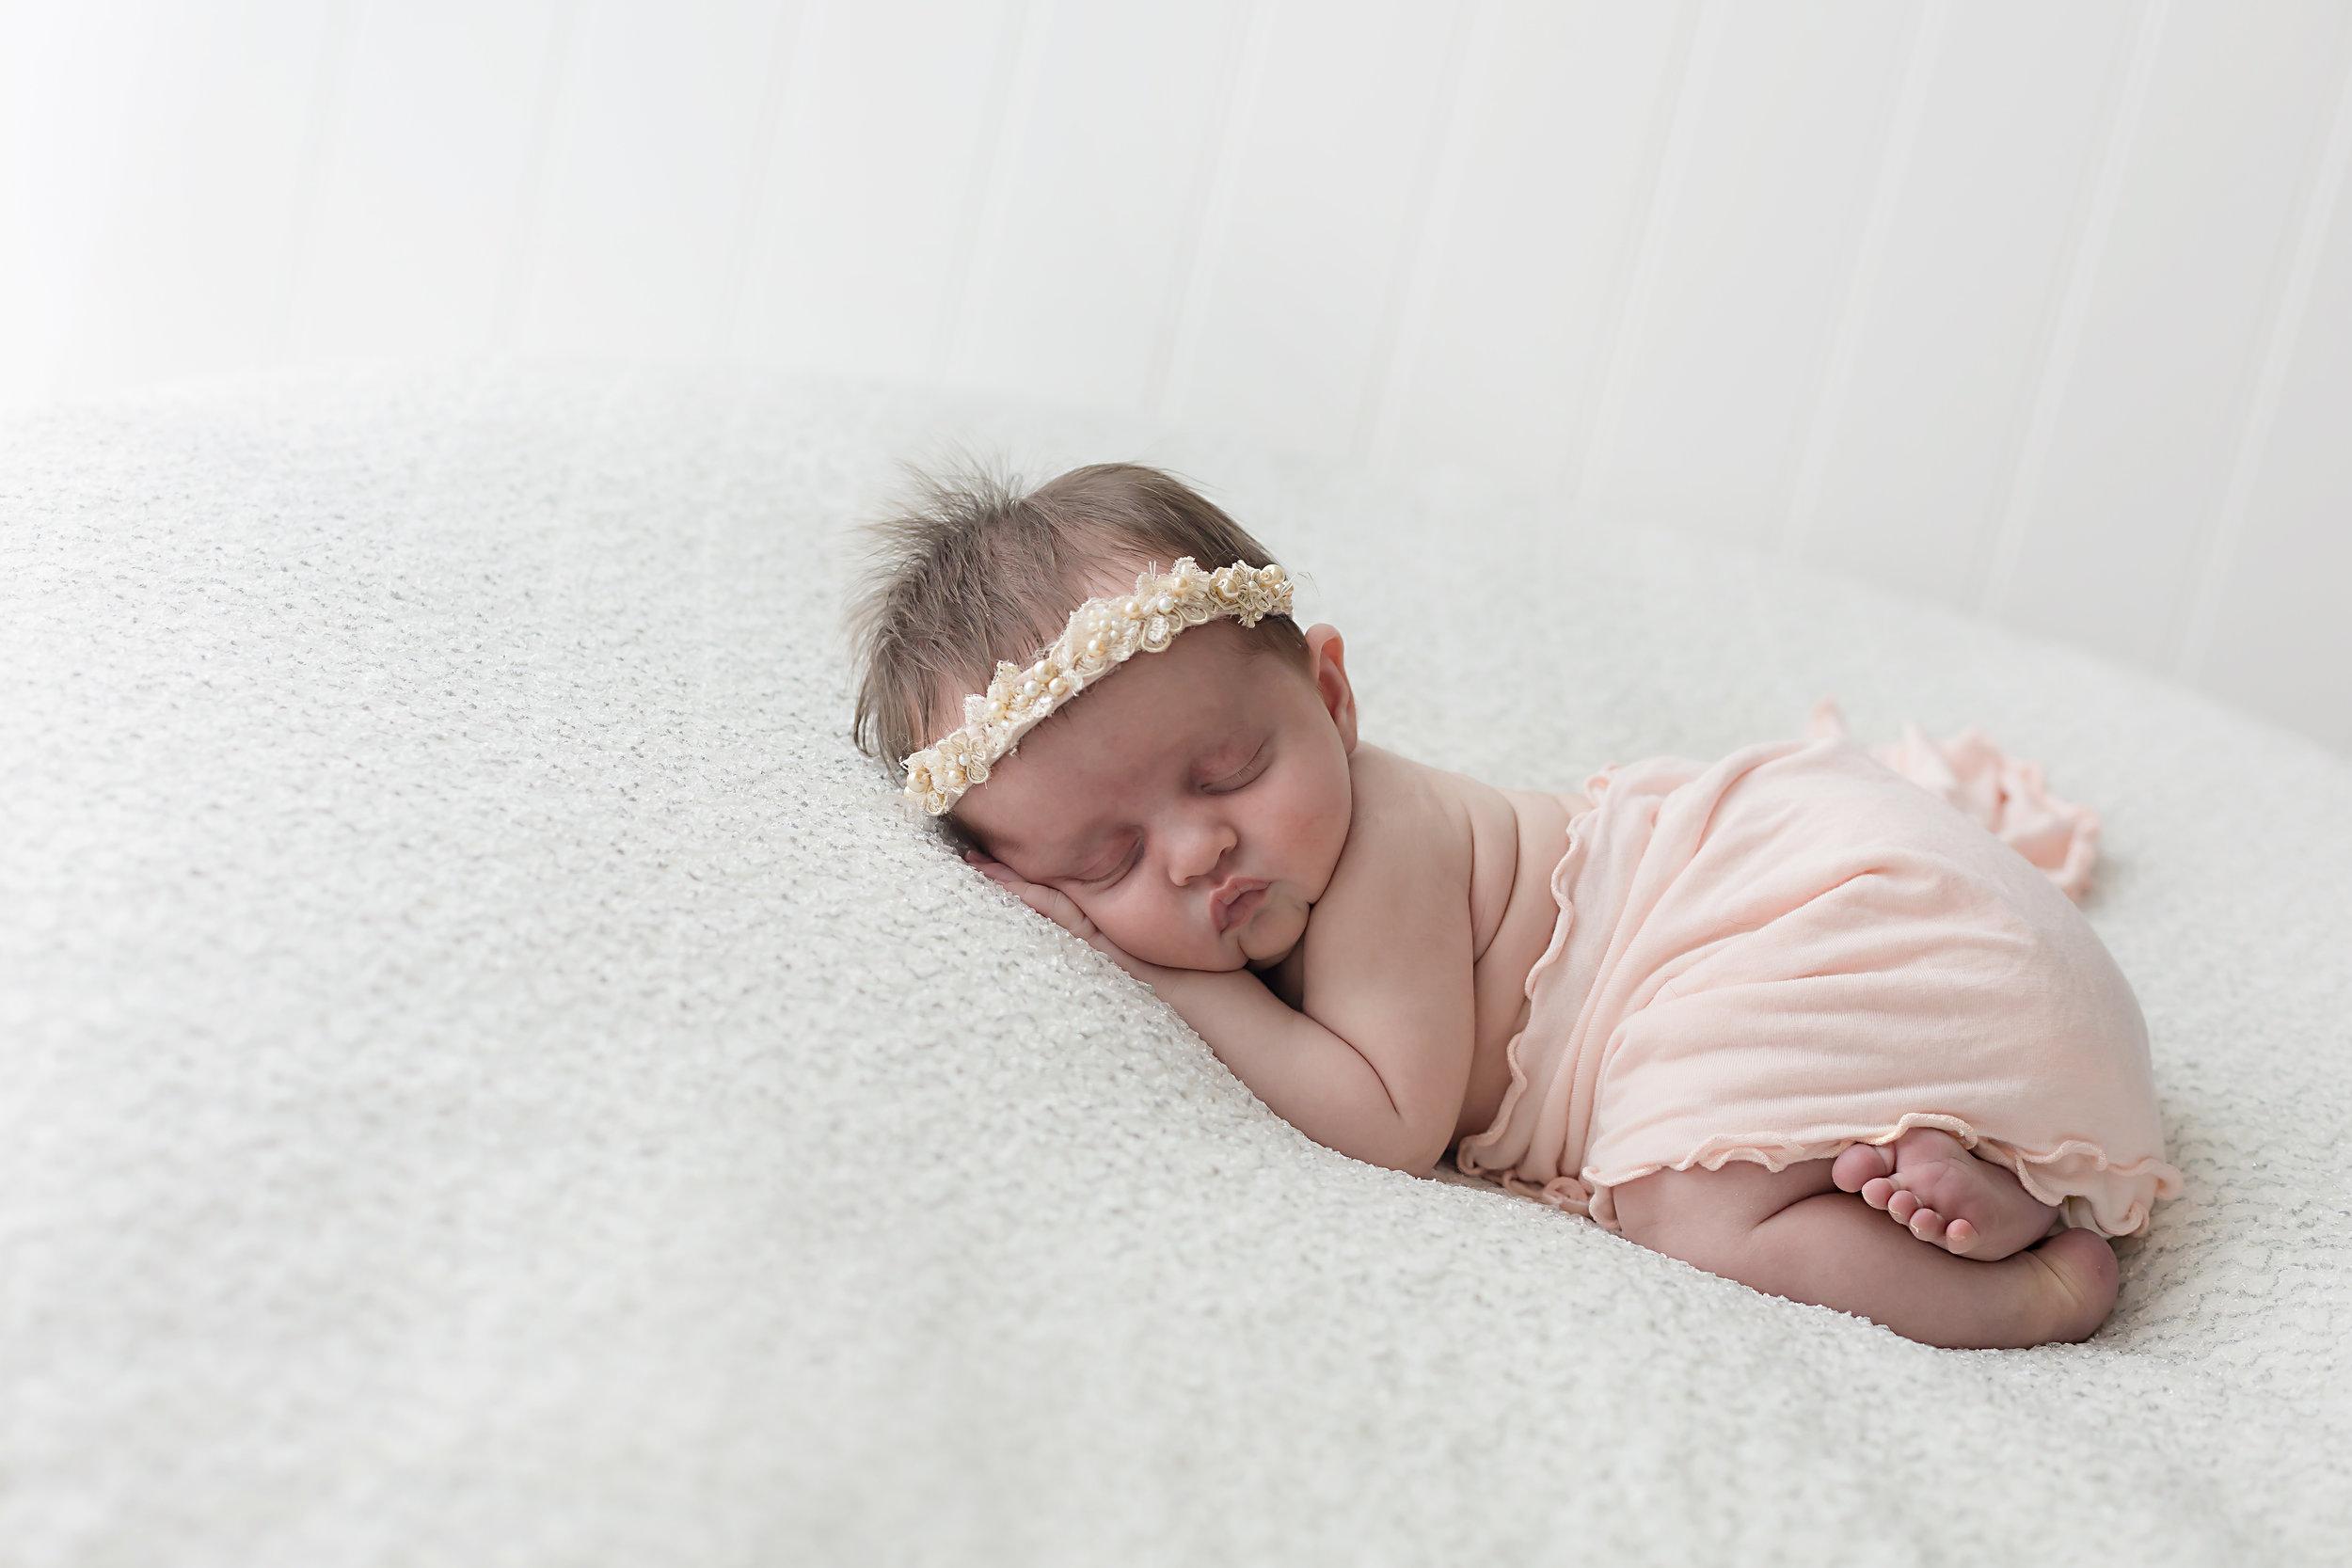 Danirosephotography.newbornphotographeraberdeen.minisession.6.jpg